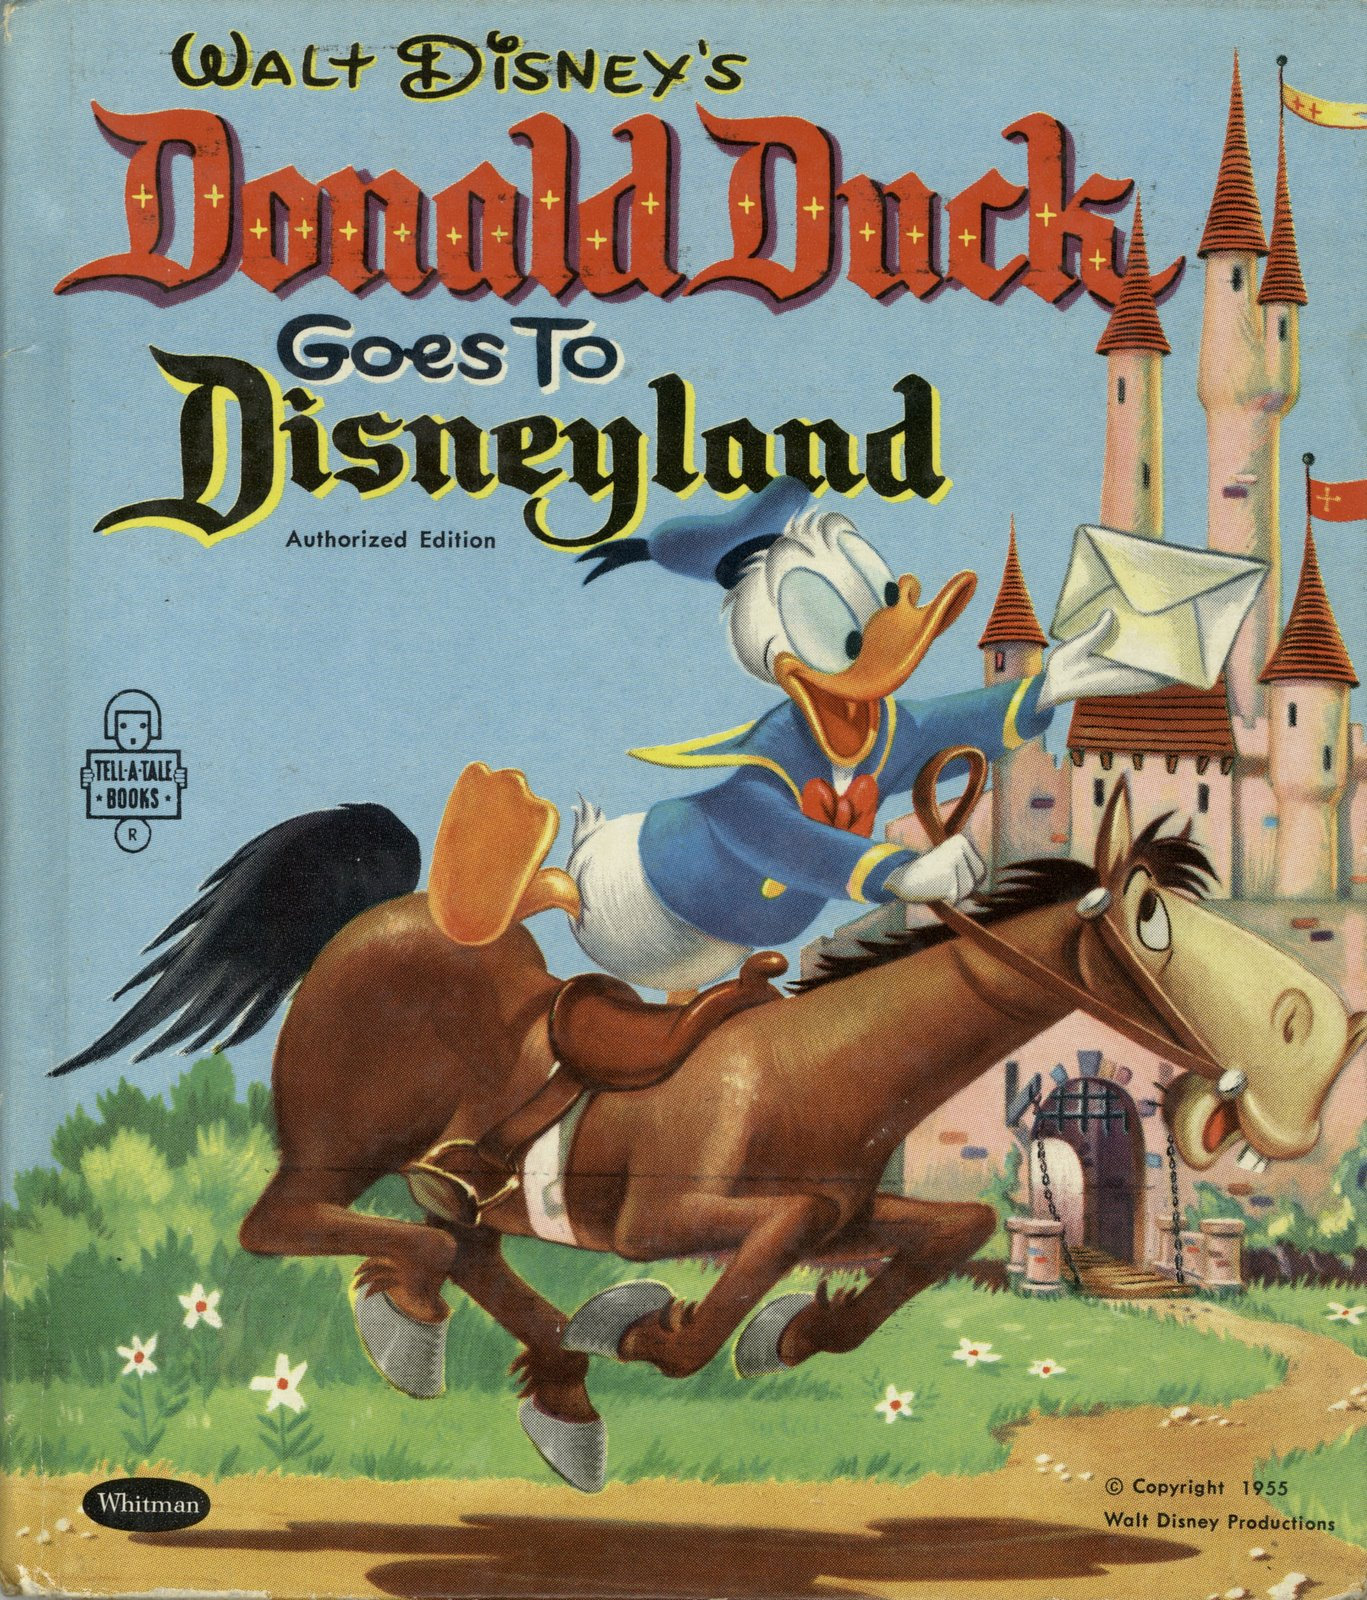 Donald Duck Goes to Disneyland